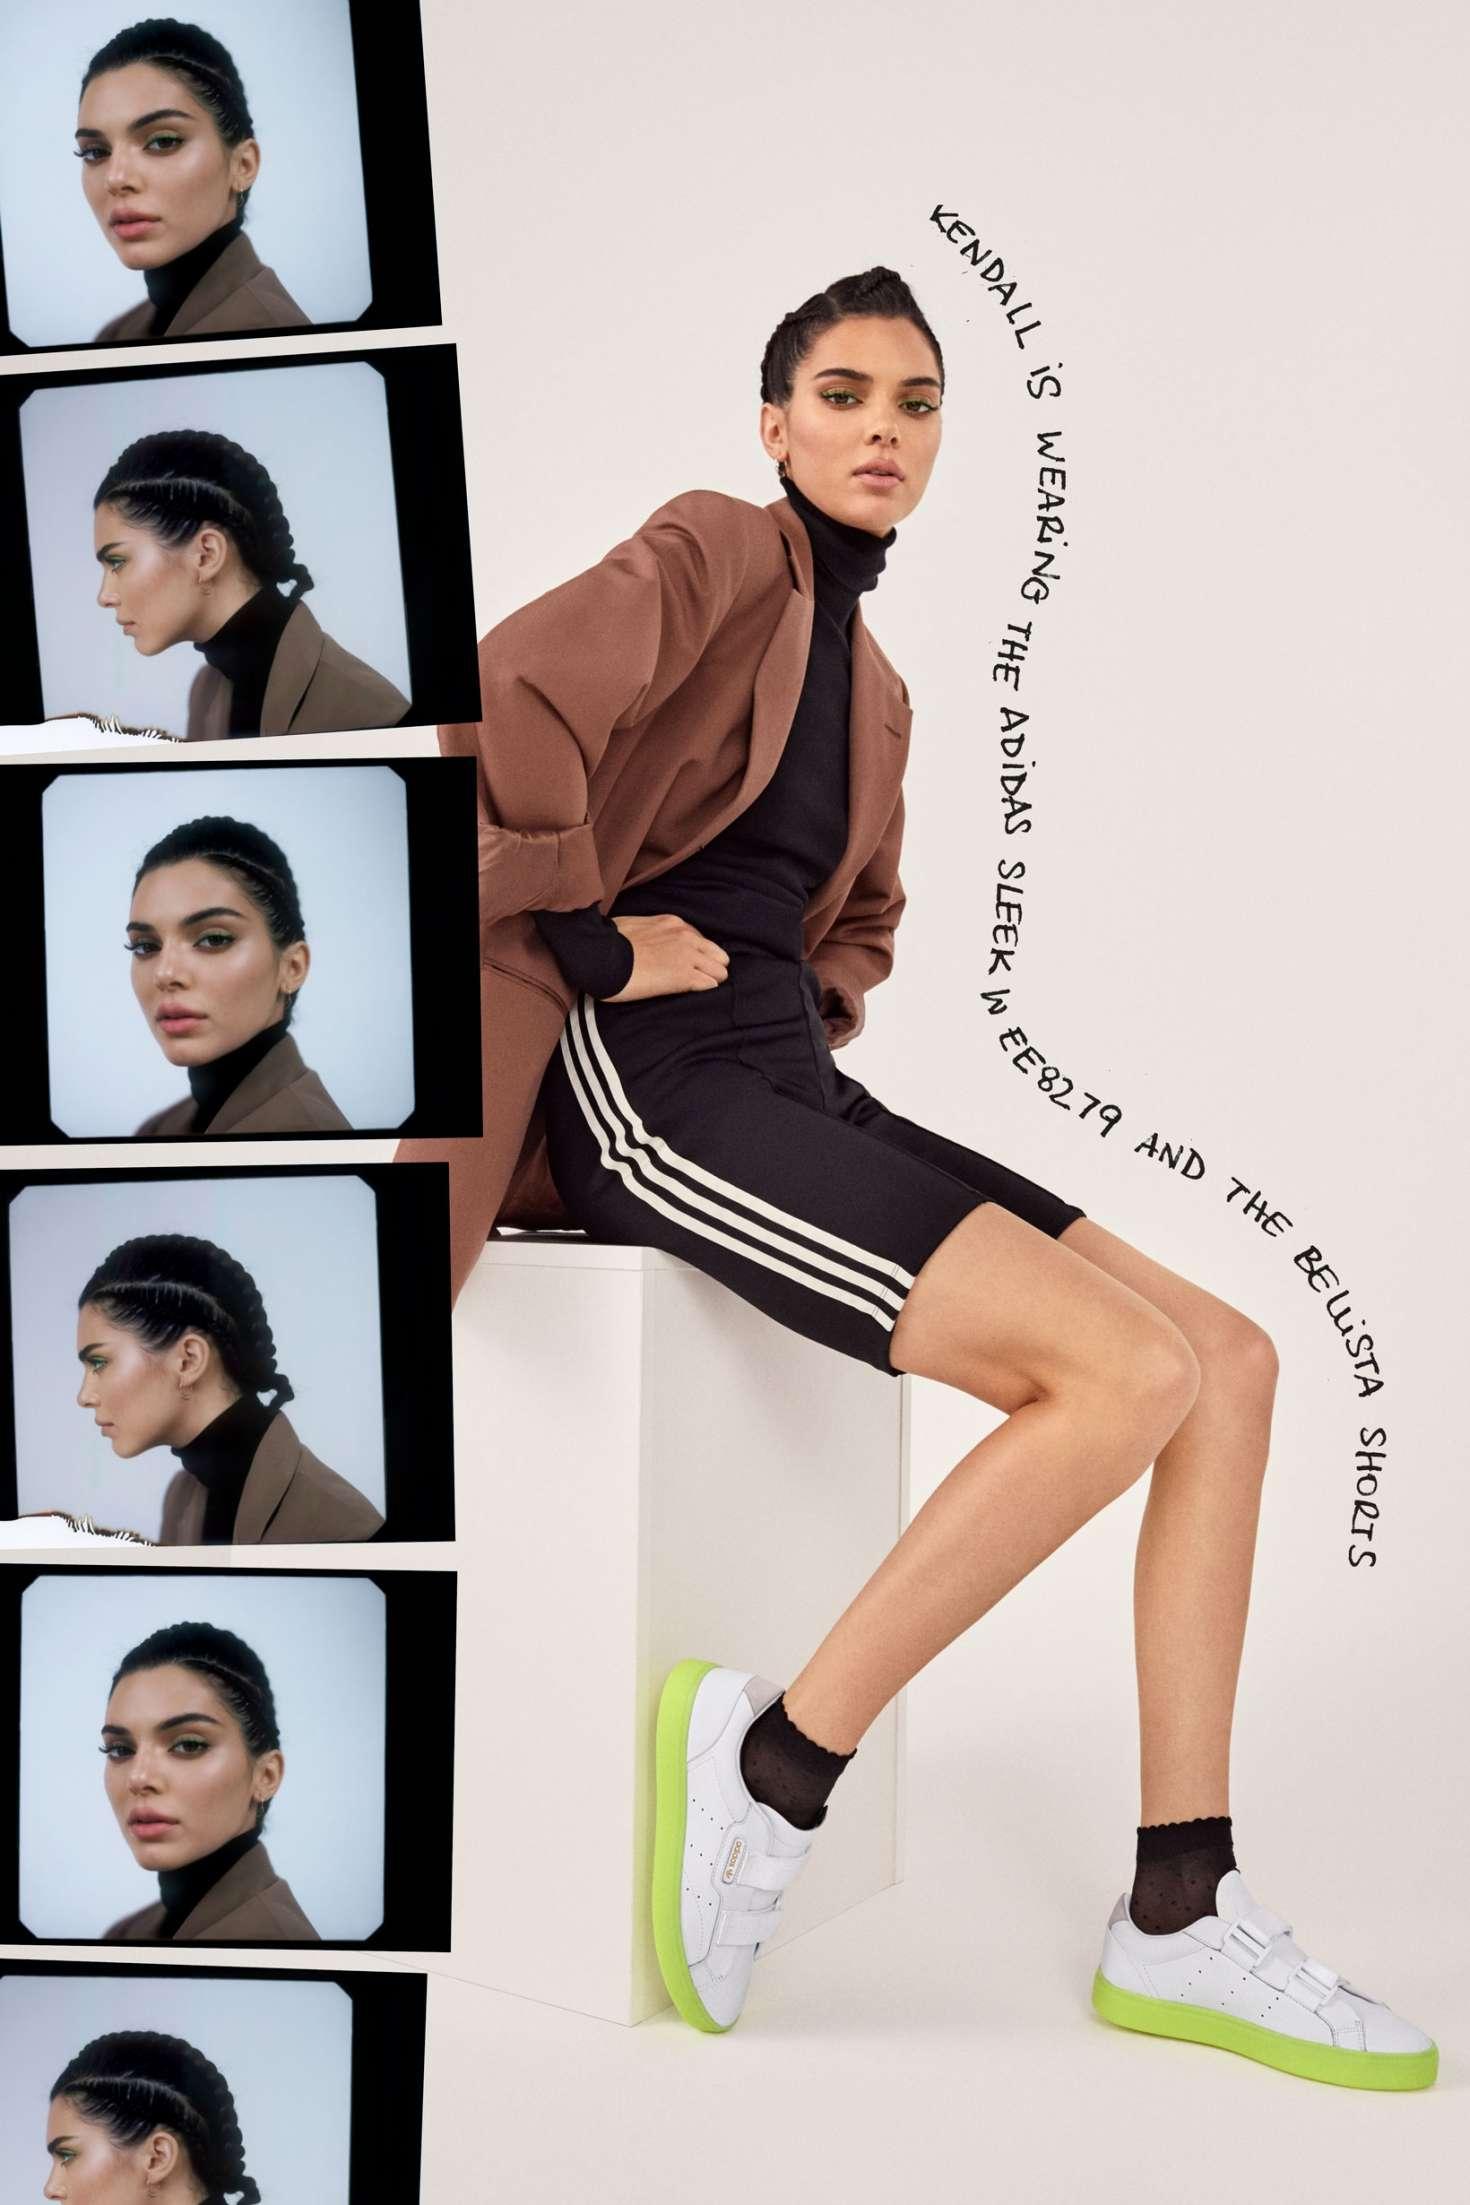 Kendall Jenner 2019 : Kendall Jenner: Adidas New Sleek Lookbook 2019 Collection -13